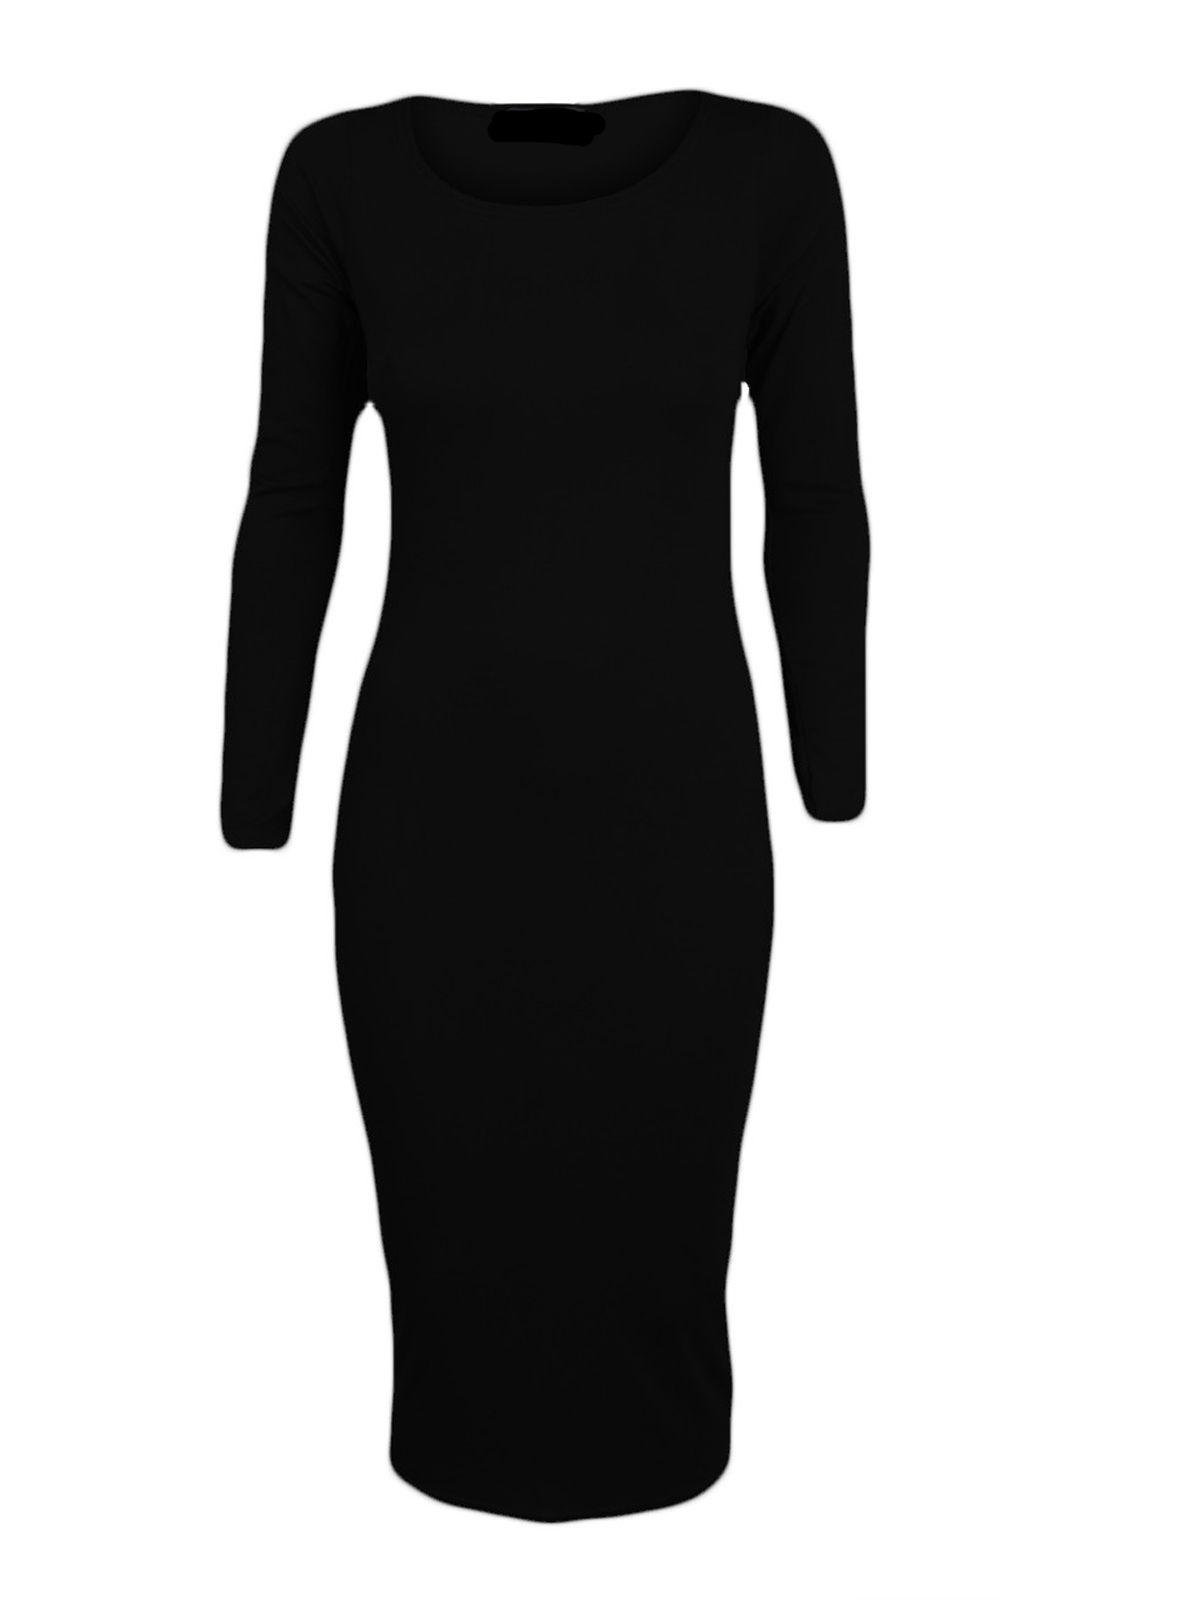 Long sleeved mid dress just £5 Black